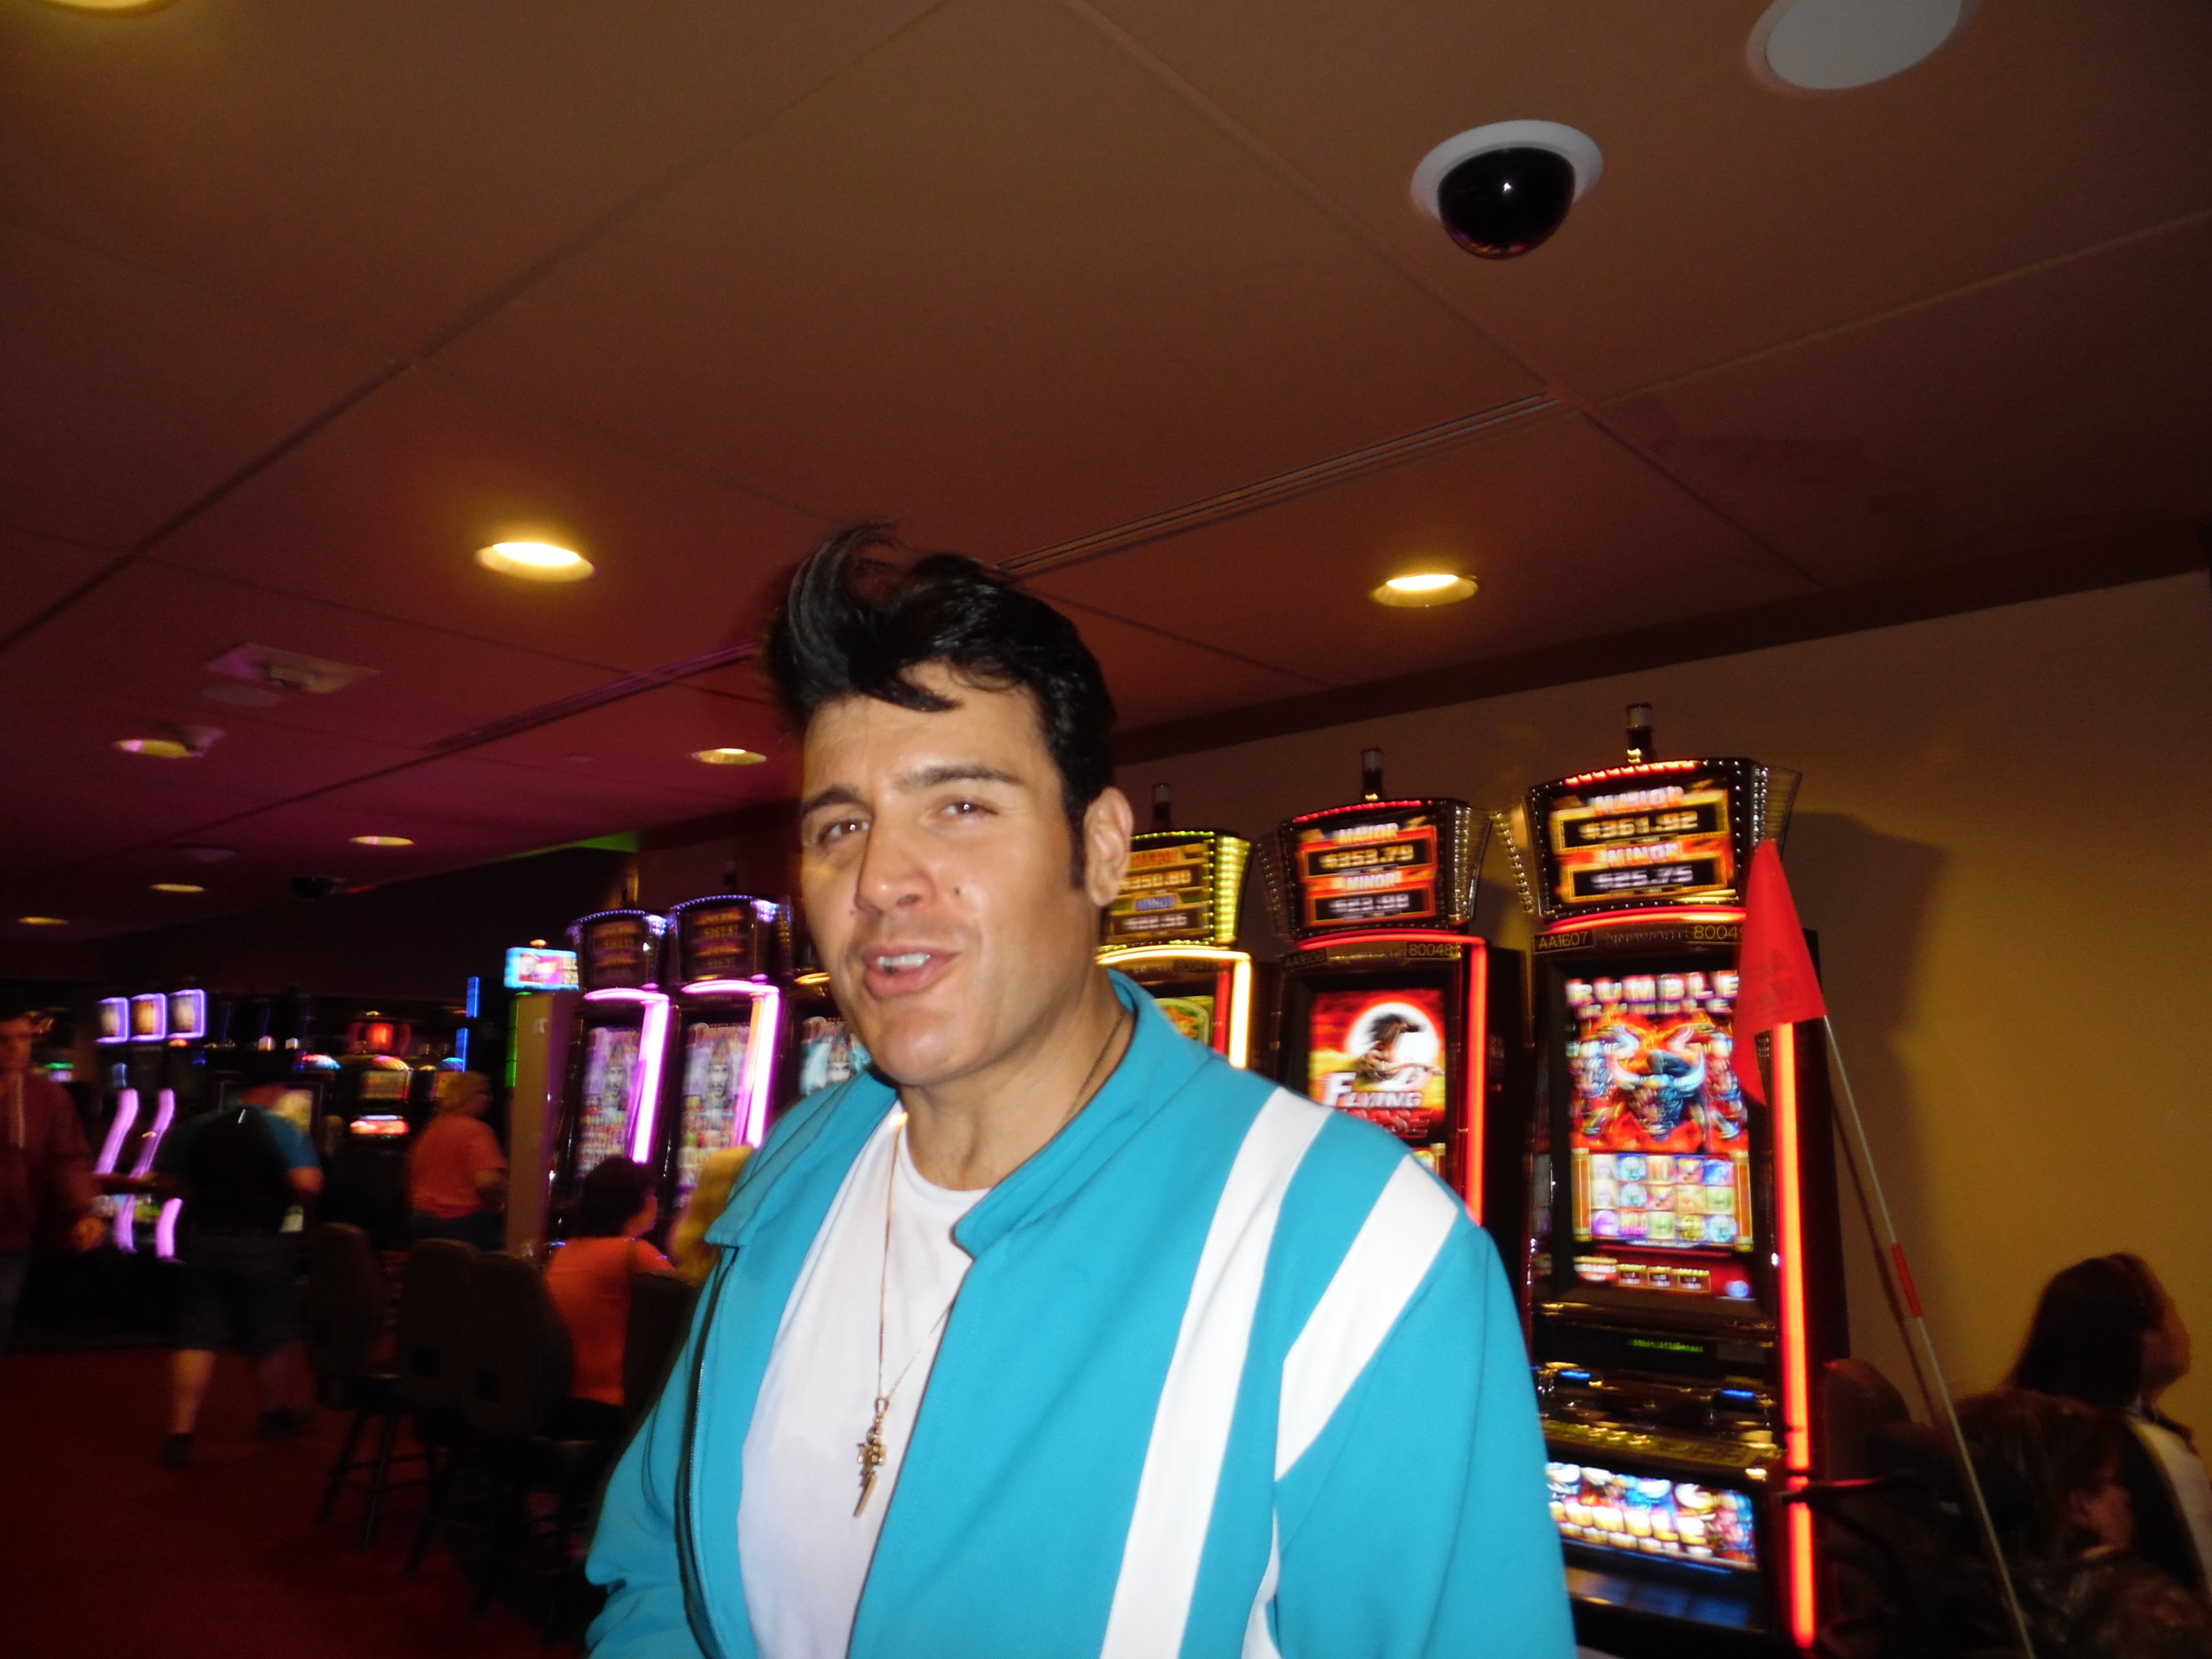 ETA  Gino Monopoli  during intermission at Brantford Casino, ON 2017